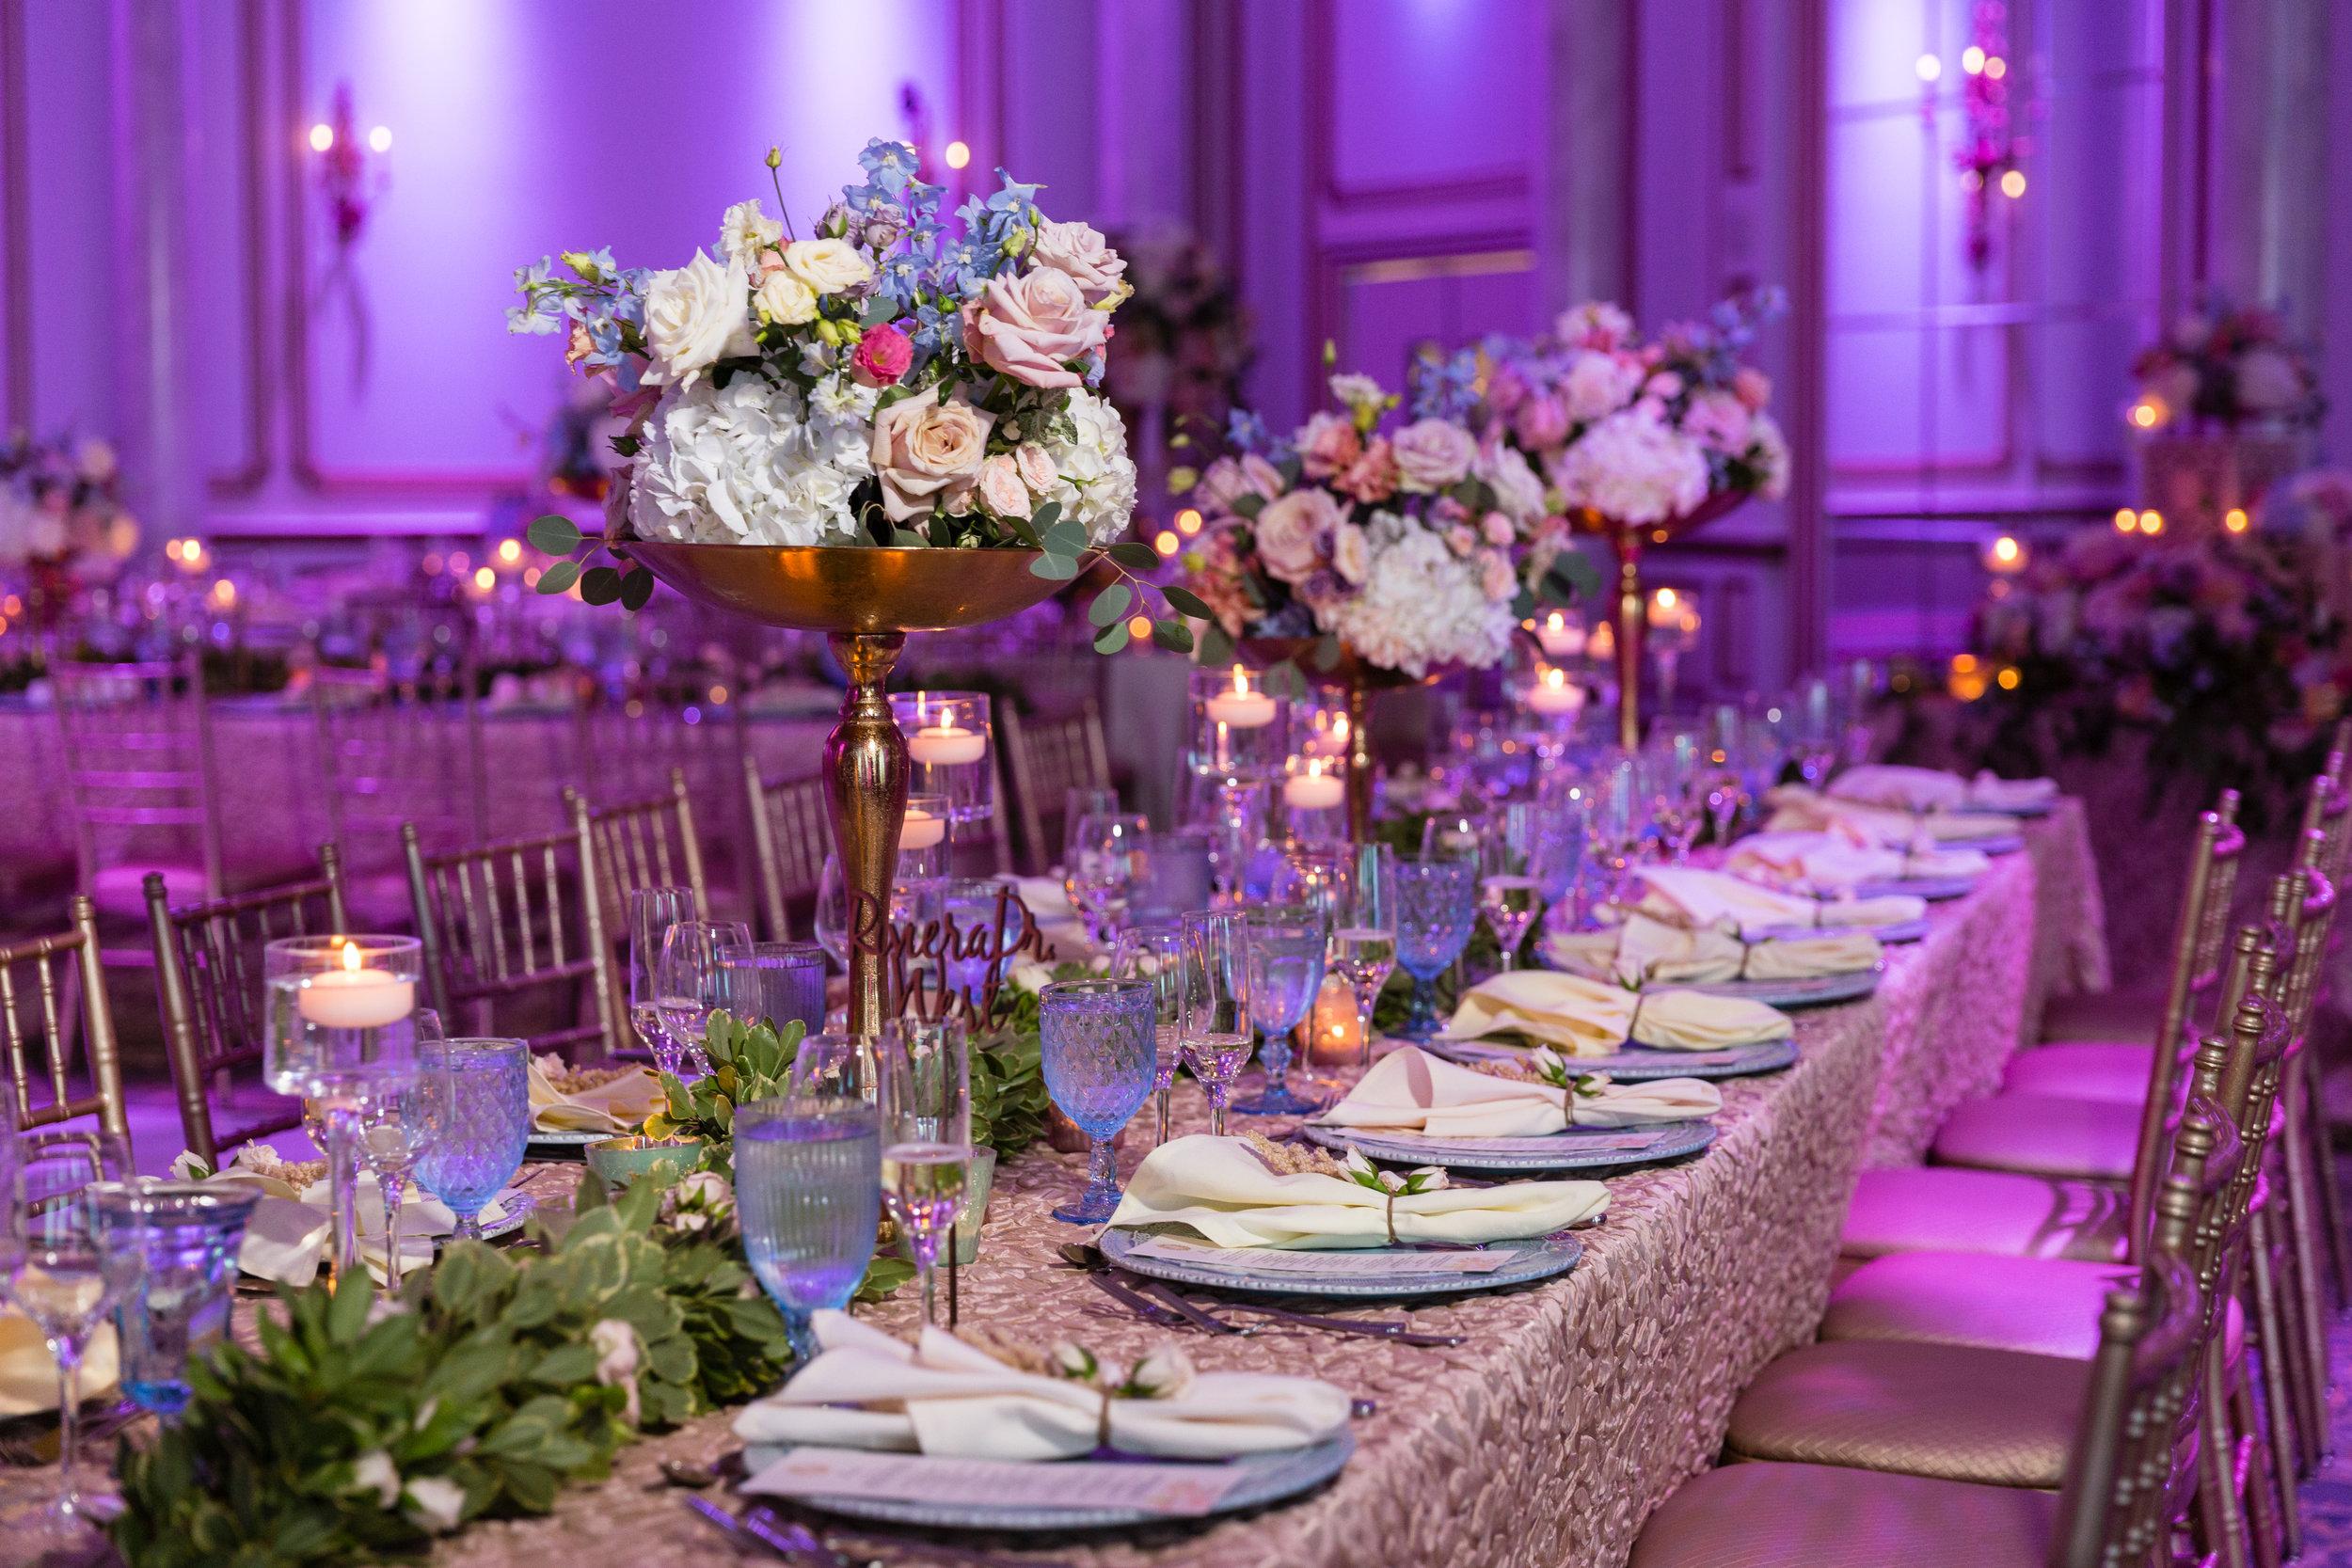 INDIAN WEDDING RECEPTION TABLE DECOR 3.jpg